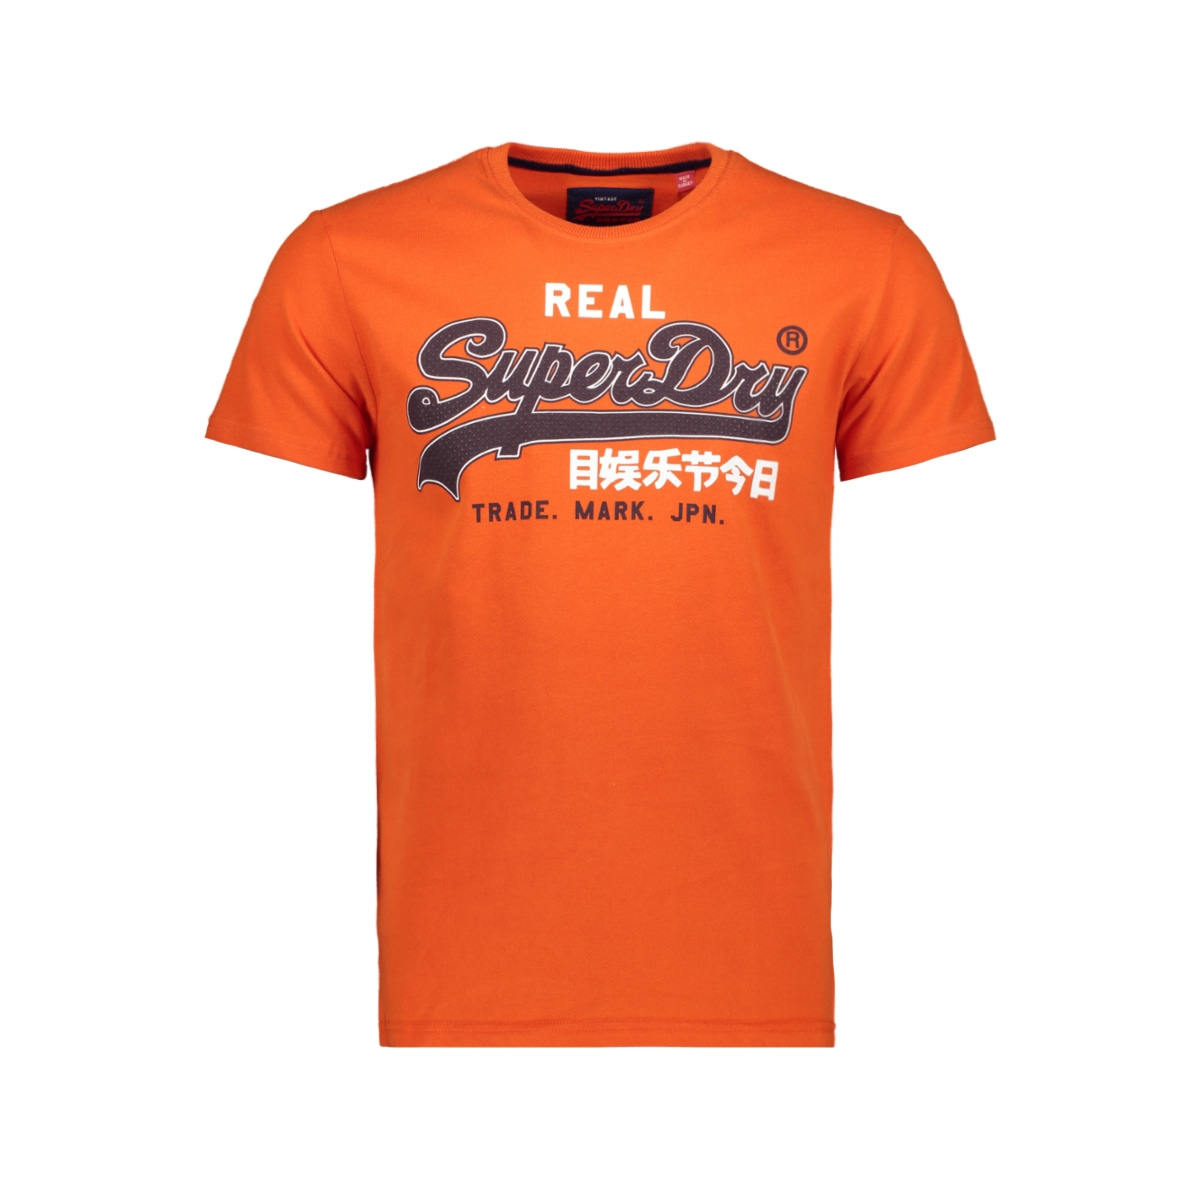 vintage logo entry tee m10007sr superdry t-shirt pitch orange